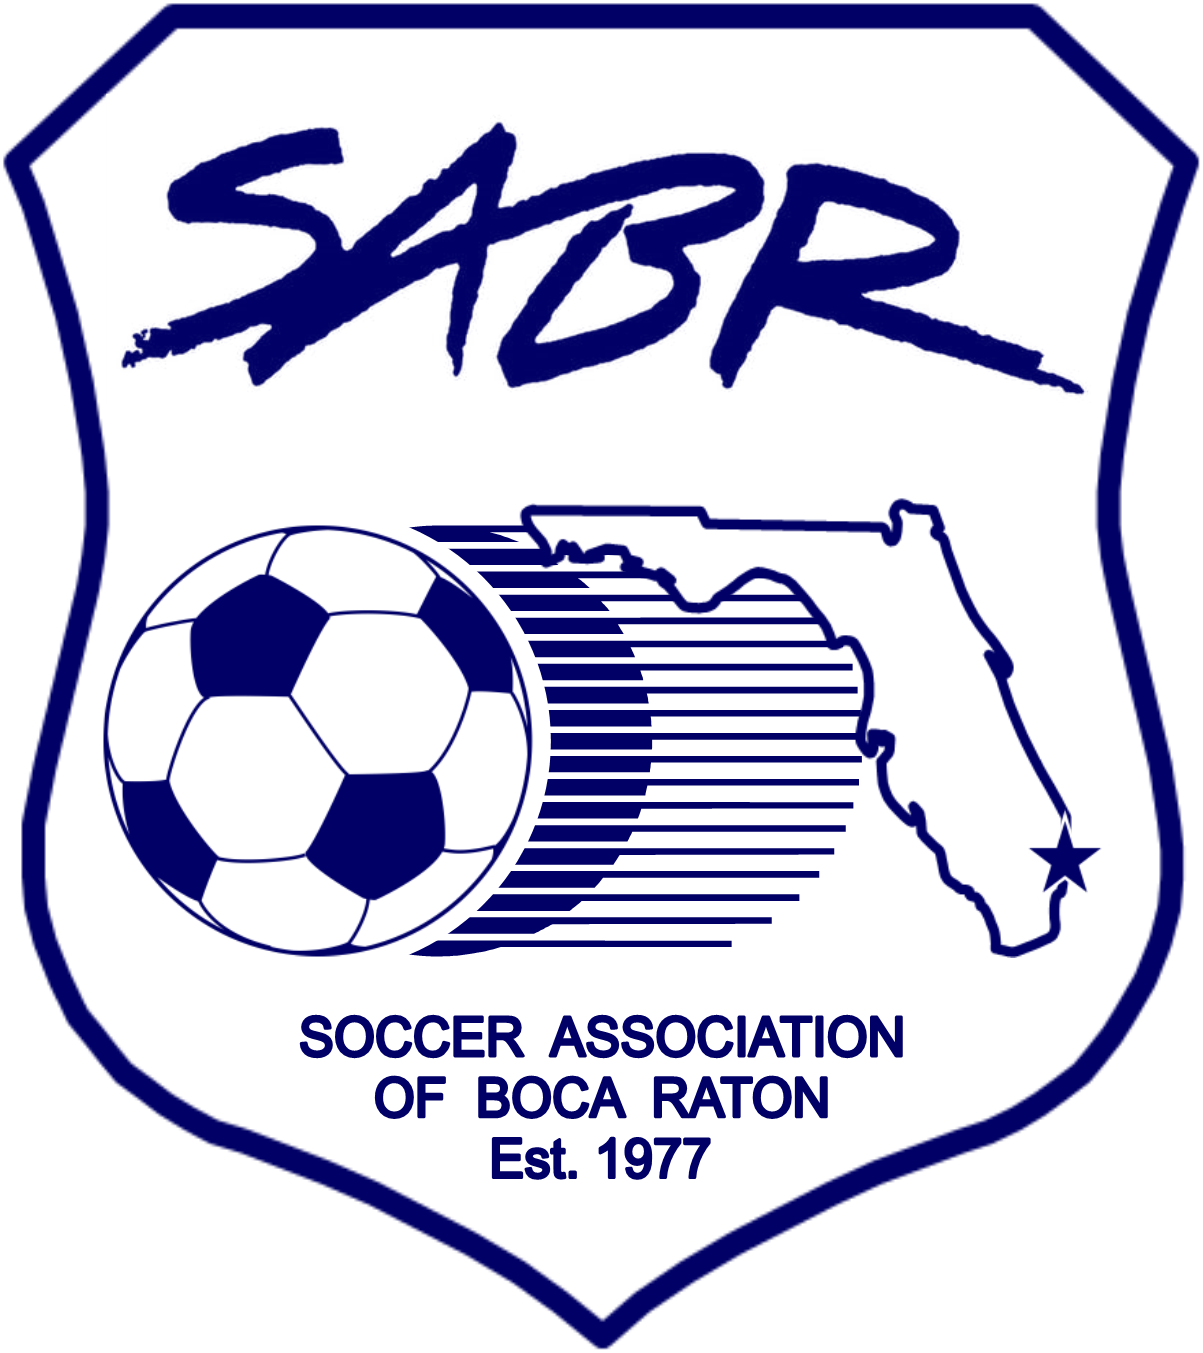 Soccer Association of Boca Raton